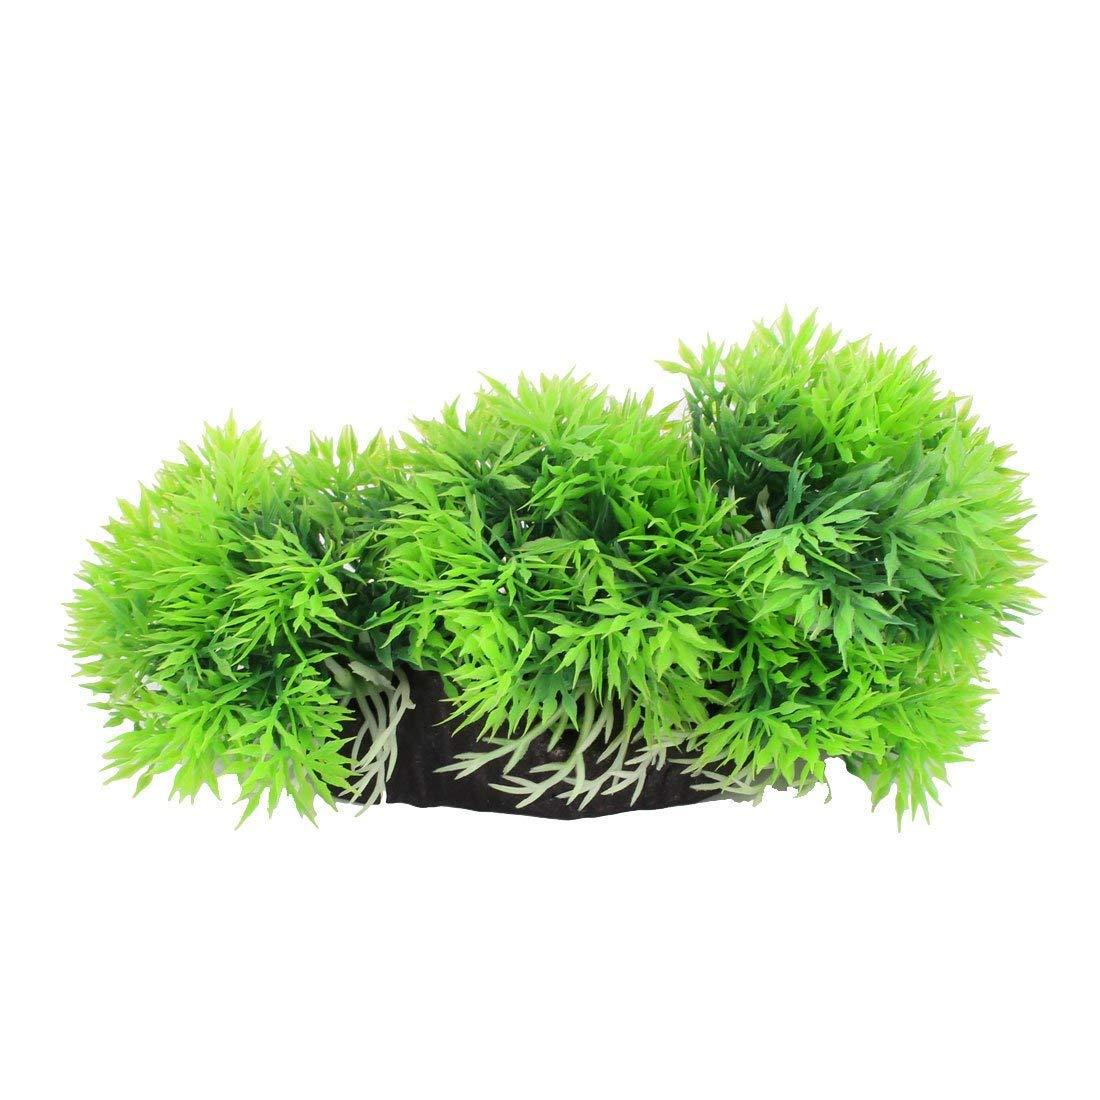 1Pc Plastic Aquarium Fishbowl Simulation Water Plant Flower Grass Ornament